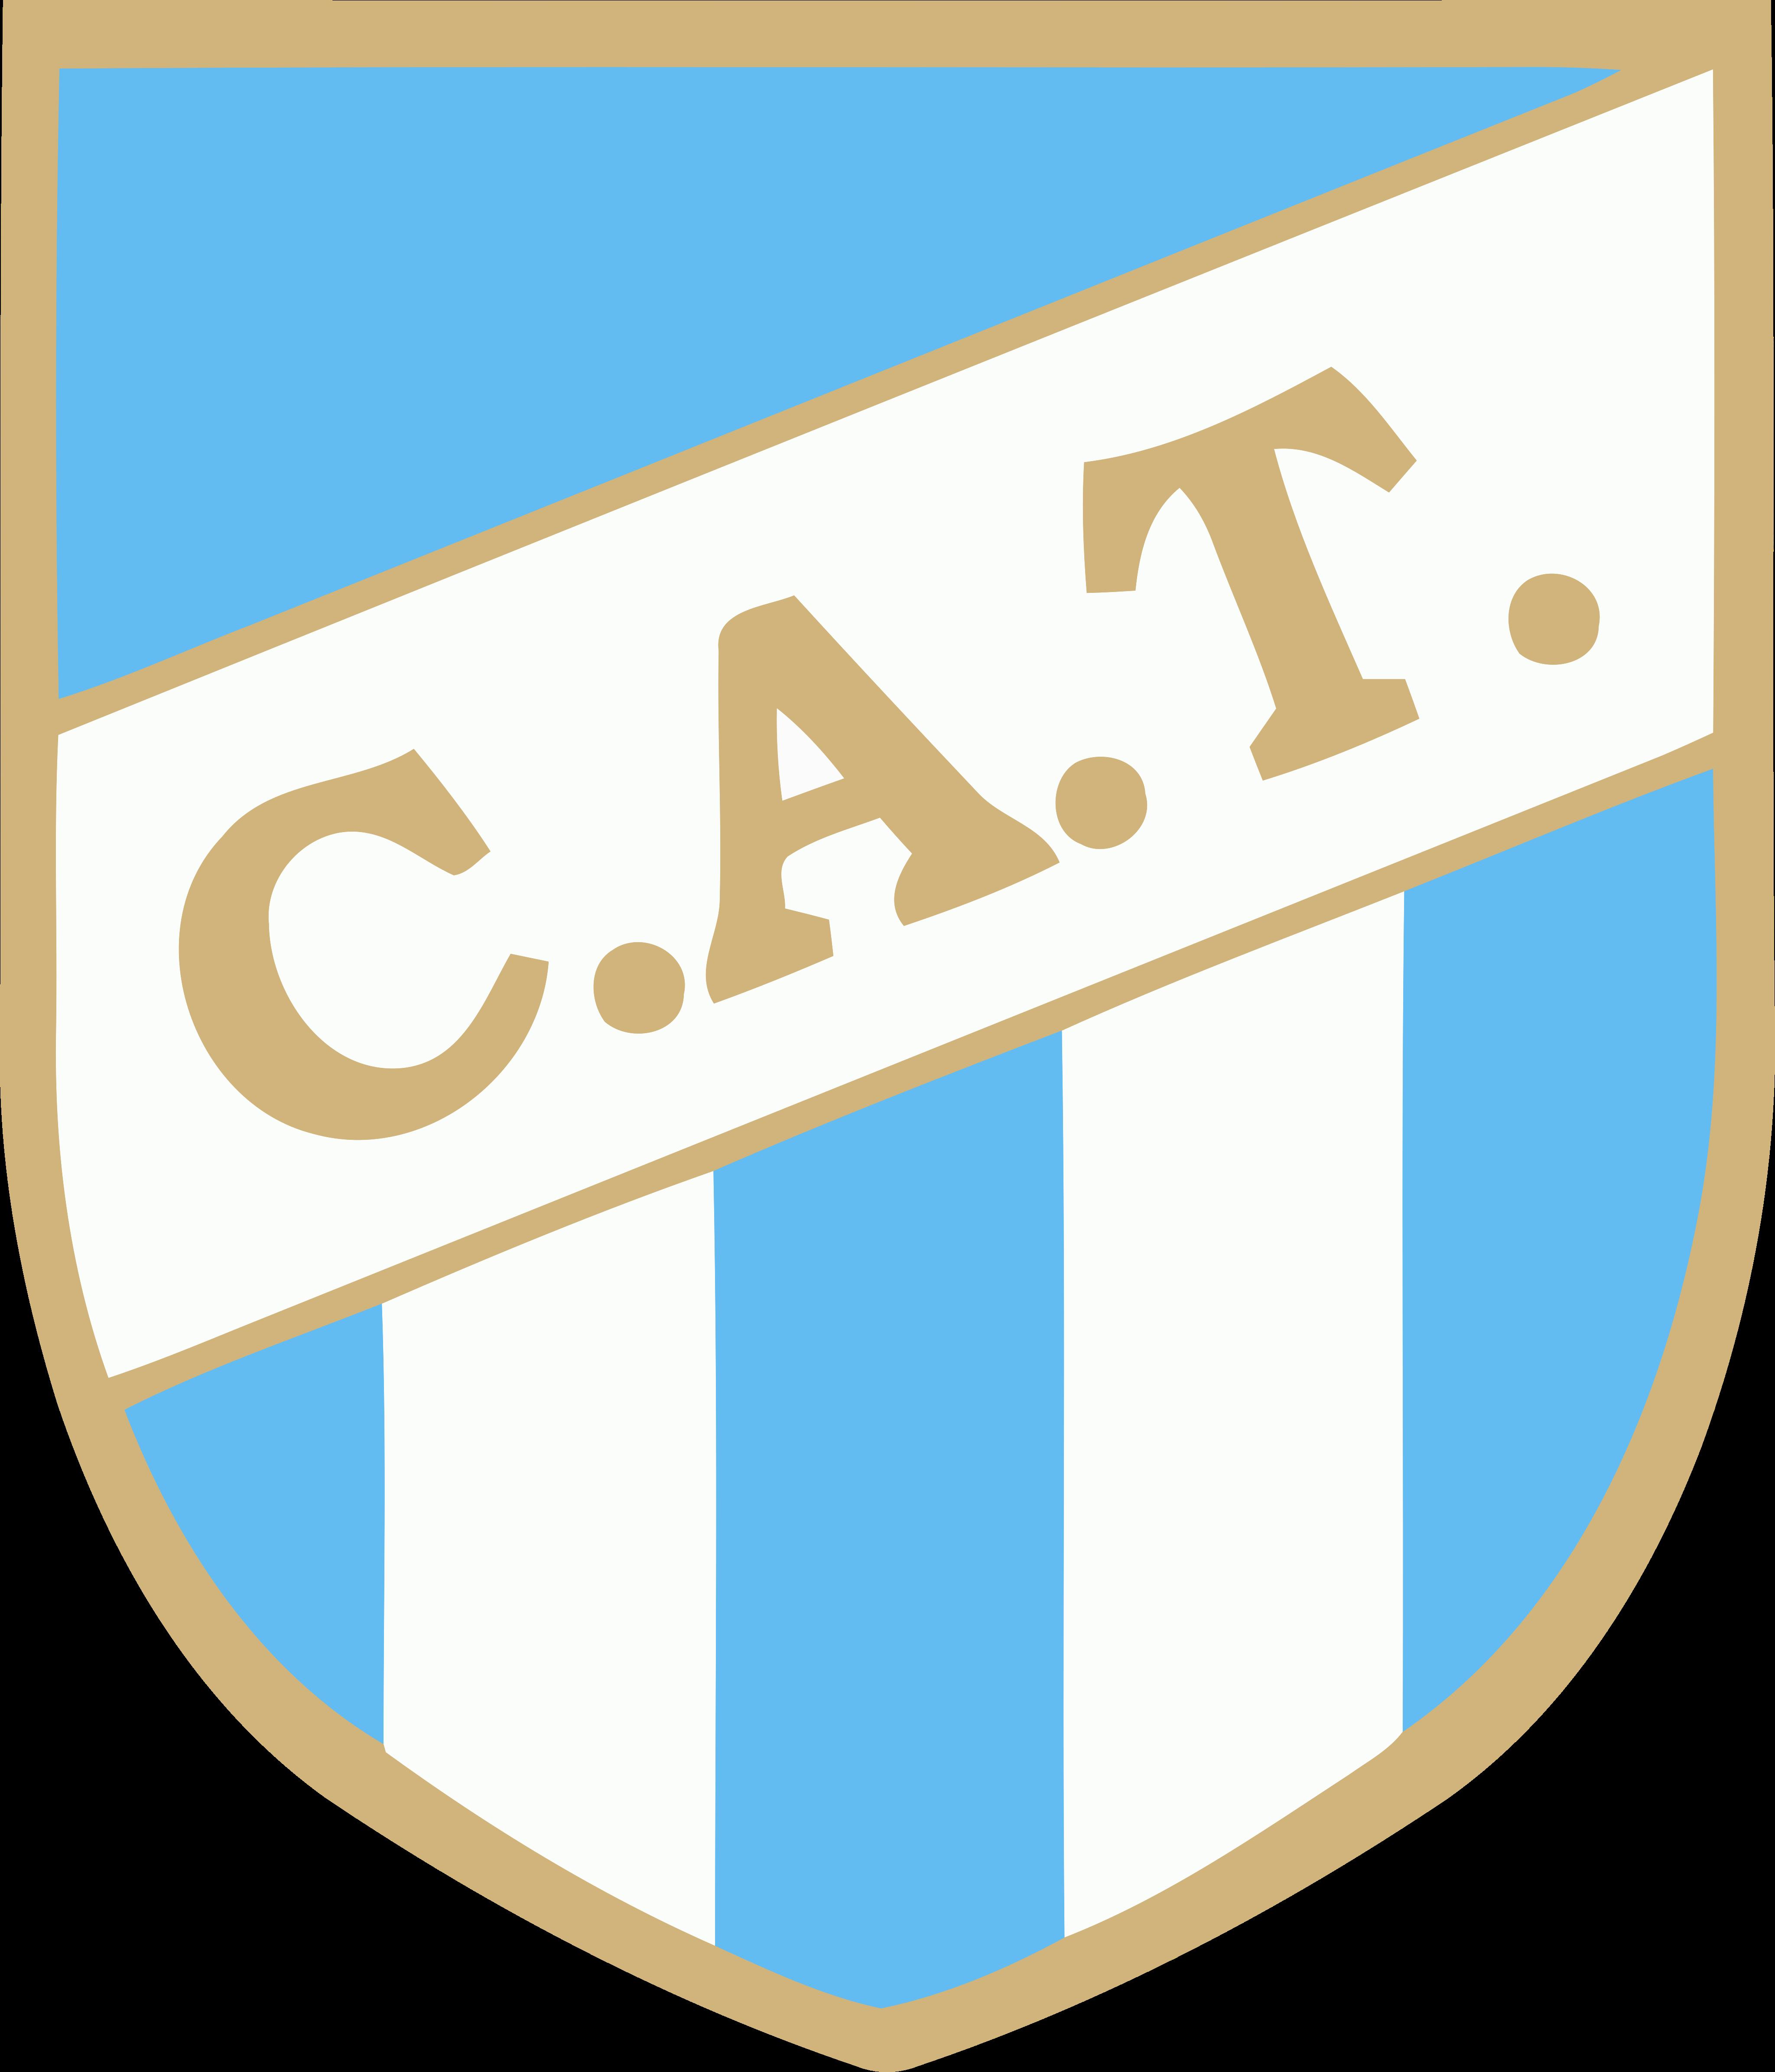 atletico tucuman logo 0 - Club Atlético Tucumán Logo - Escudo